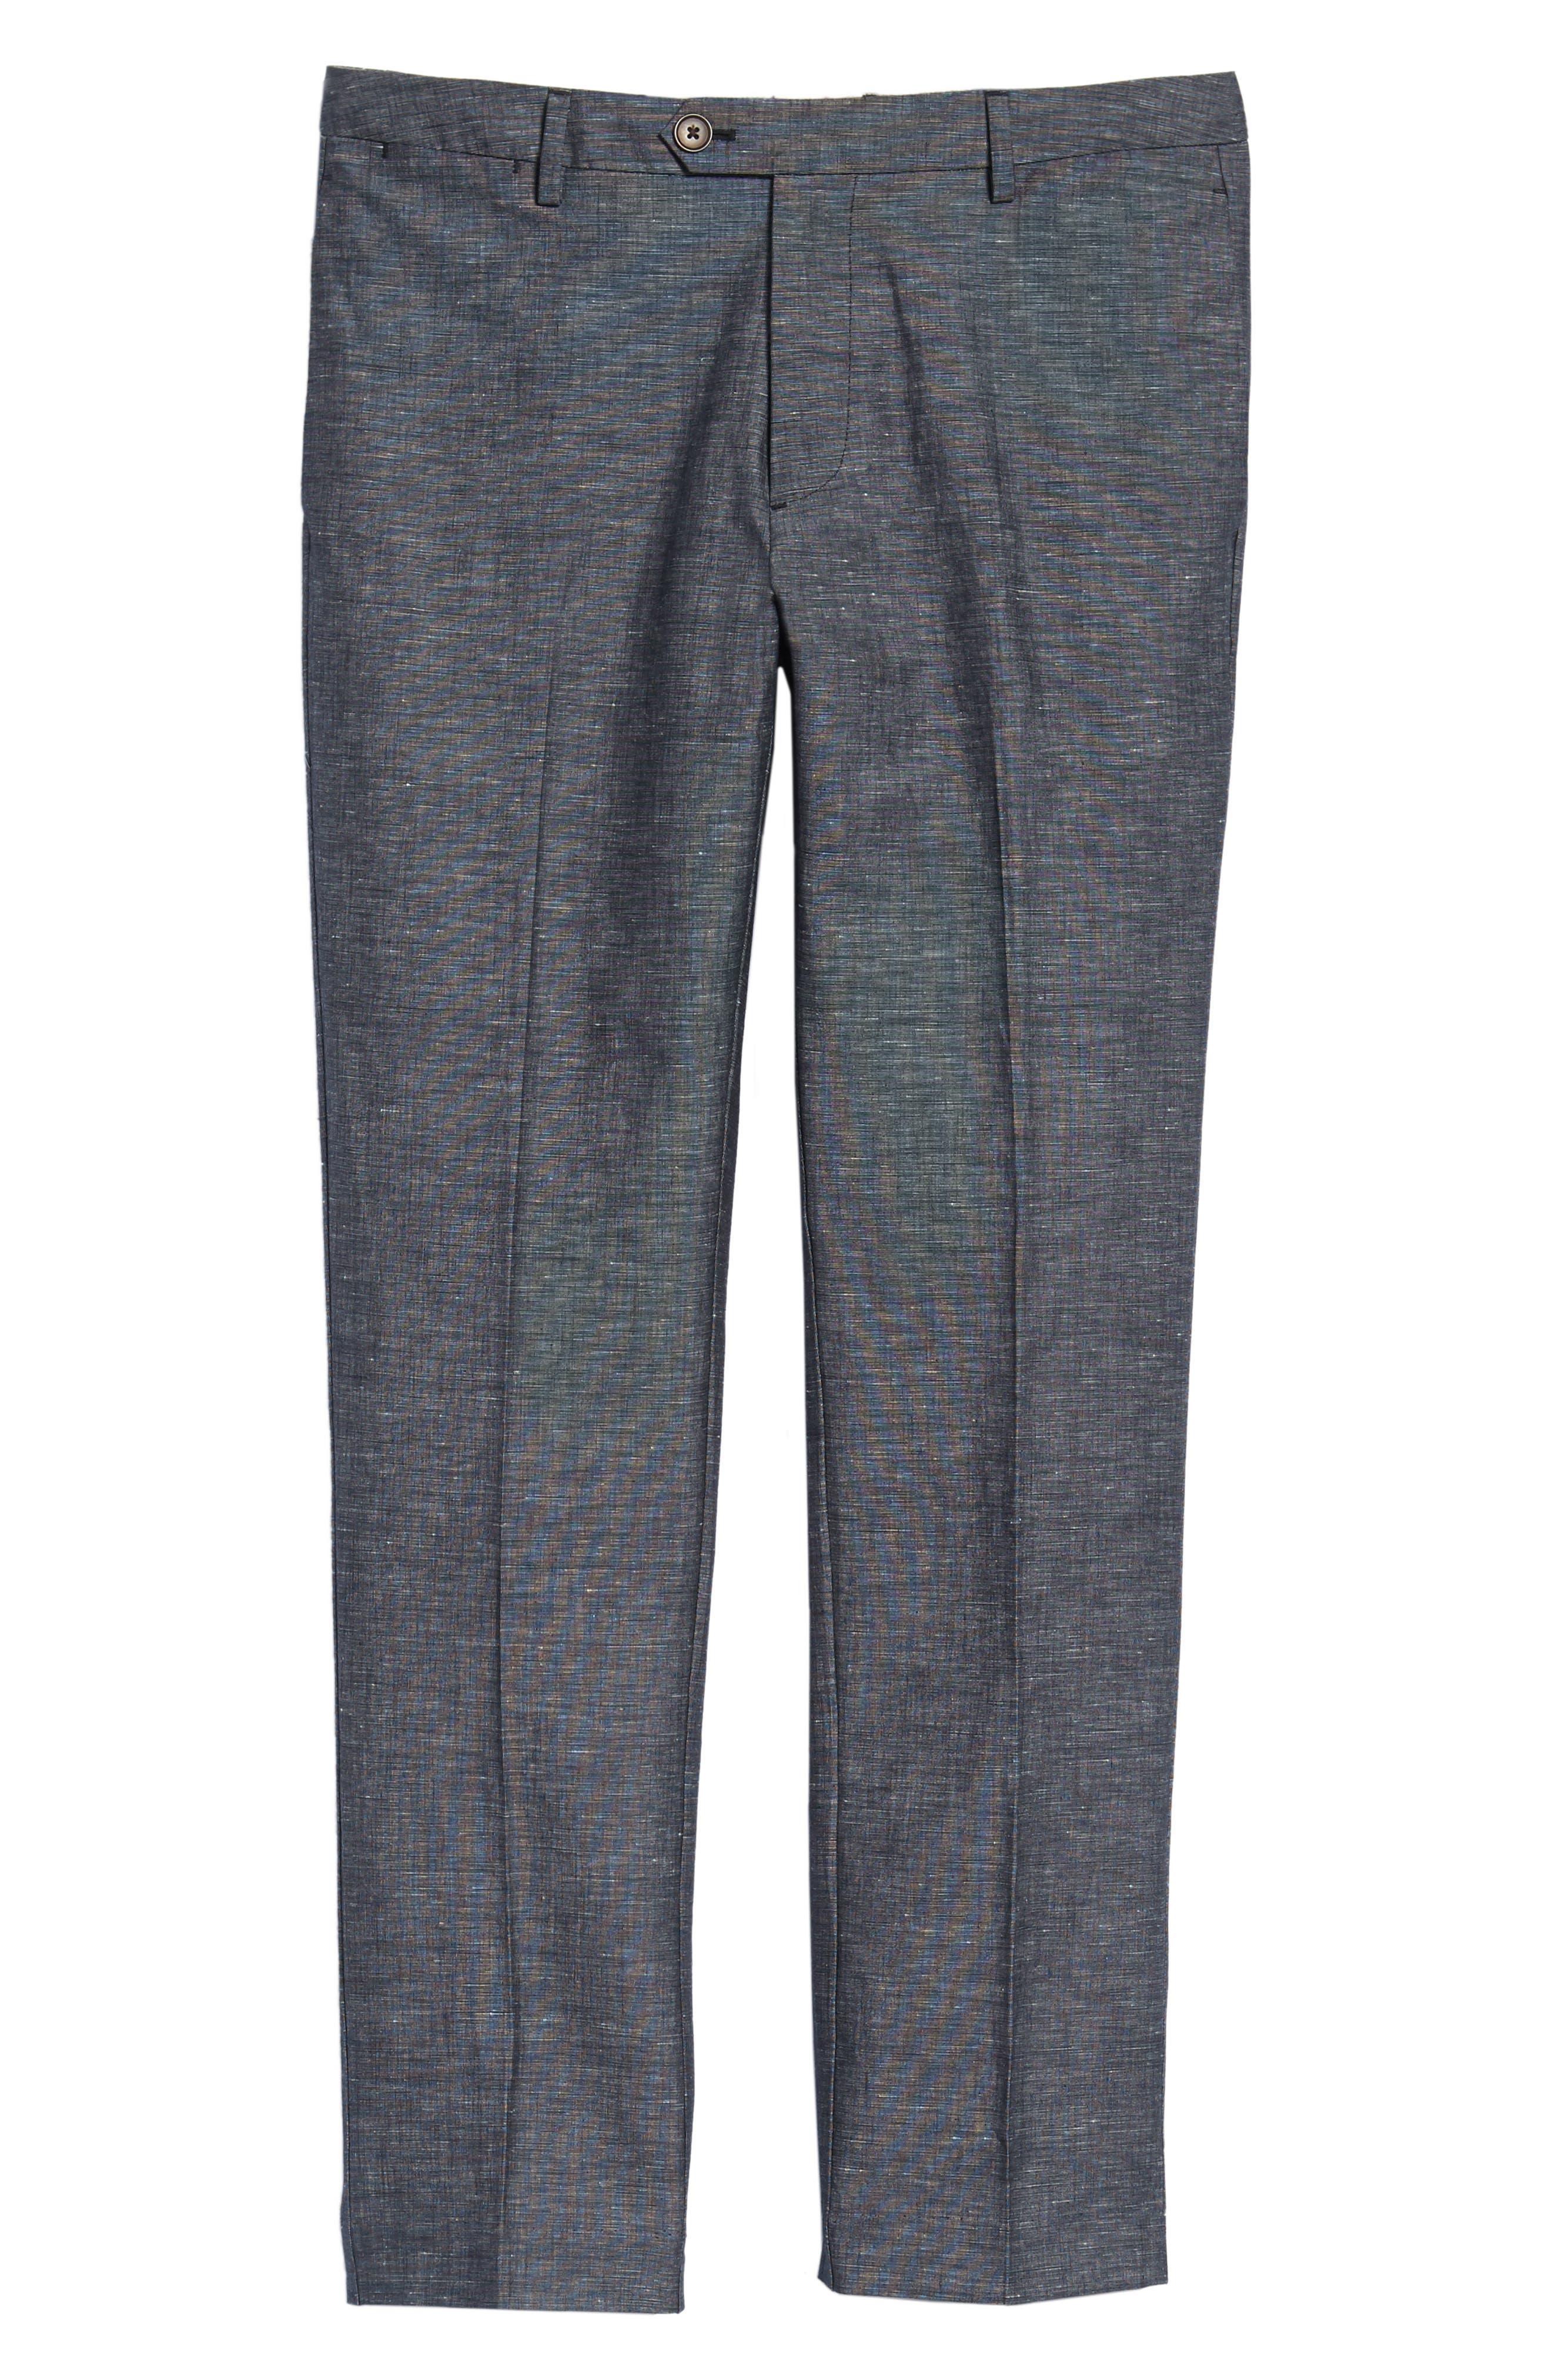 Flat Front Solid Stretch Cotton & Linen Pants,                             Alternate thumbnail 11, color,